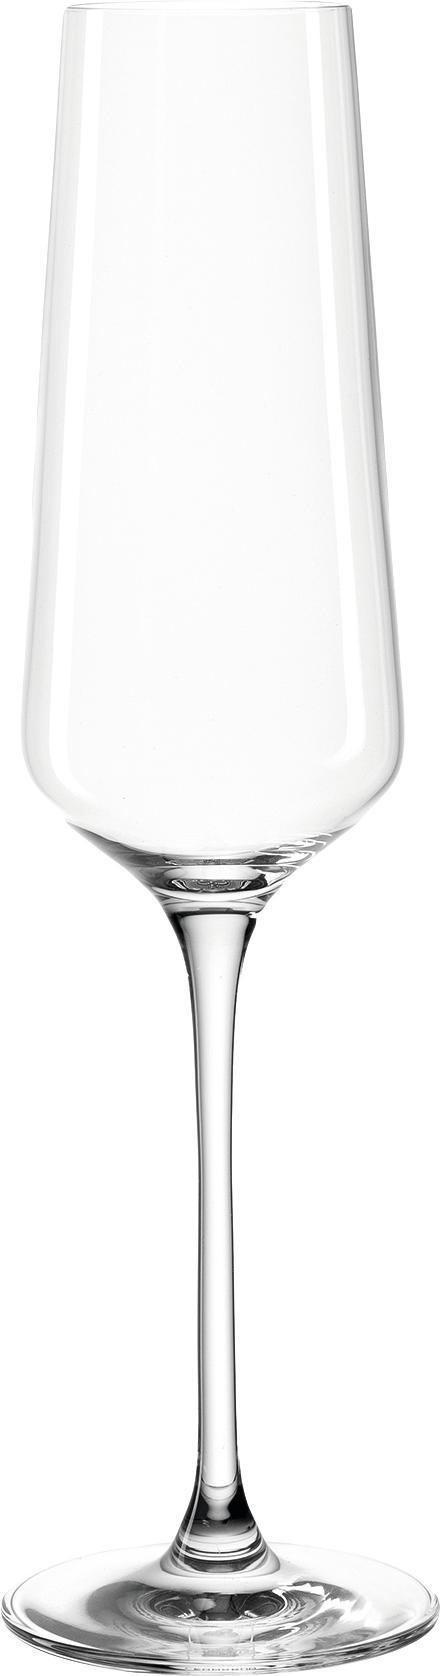 Flute champagne Puccini 6 pz, vetro Teqton®, Trasparente, Ø 7 x Alt. 26 cm